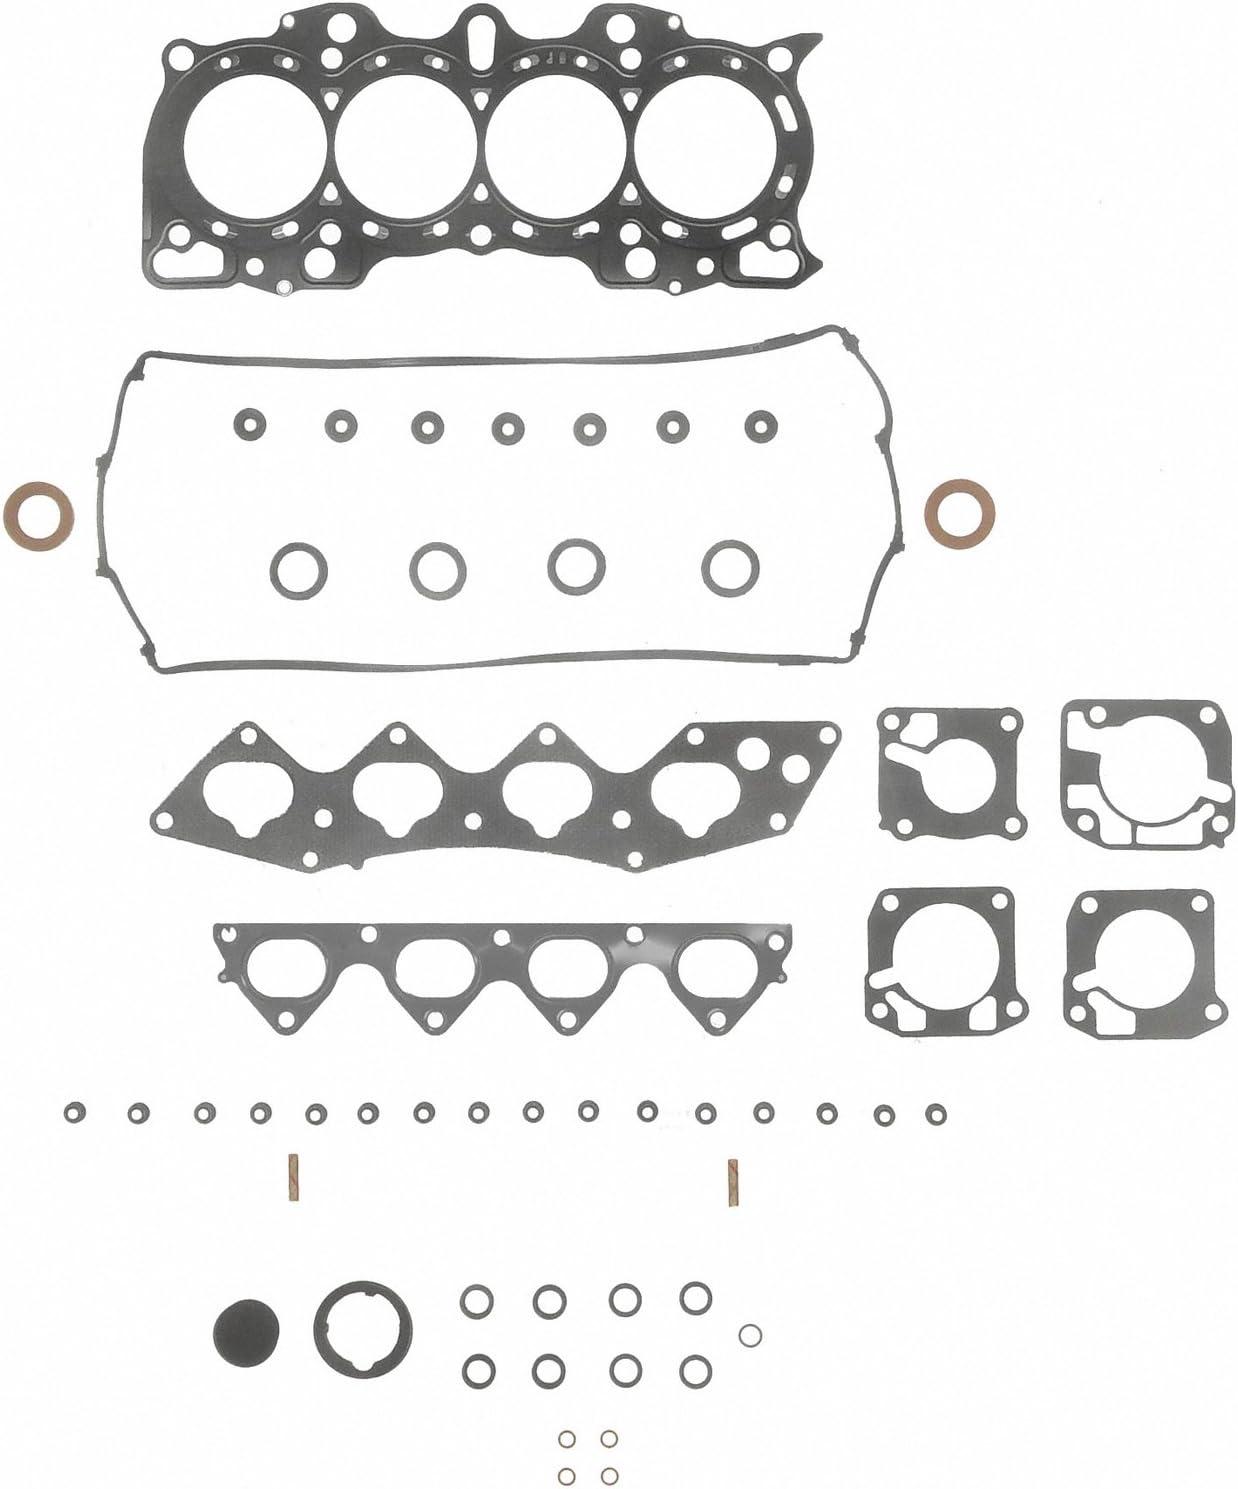 Felpro HS8604SB1 Head Gasket Set Fel-Pro